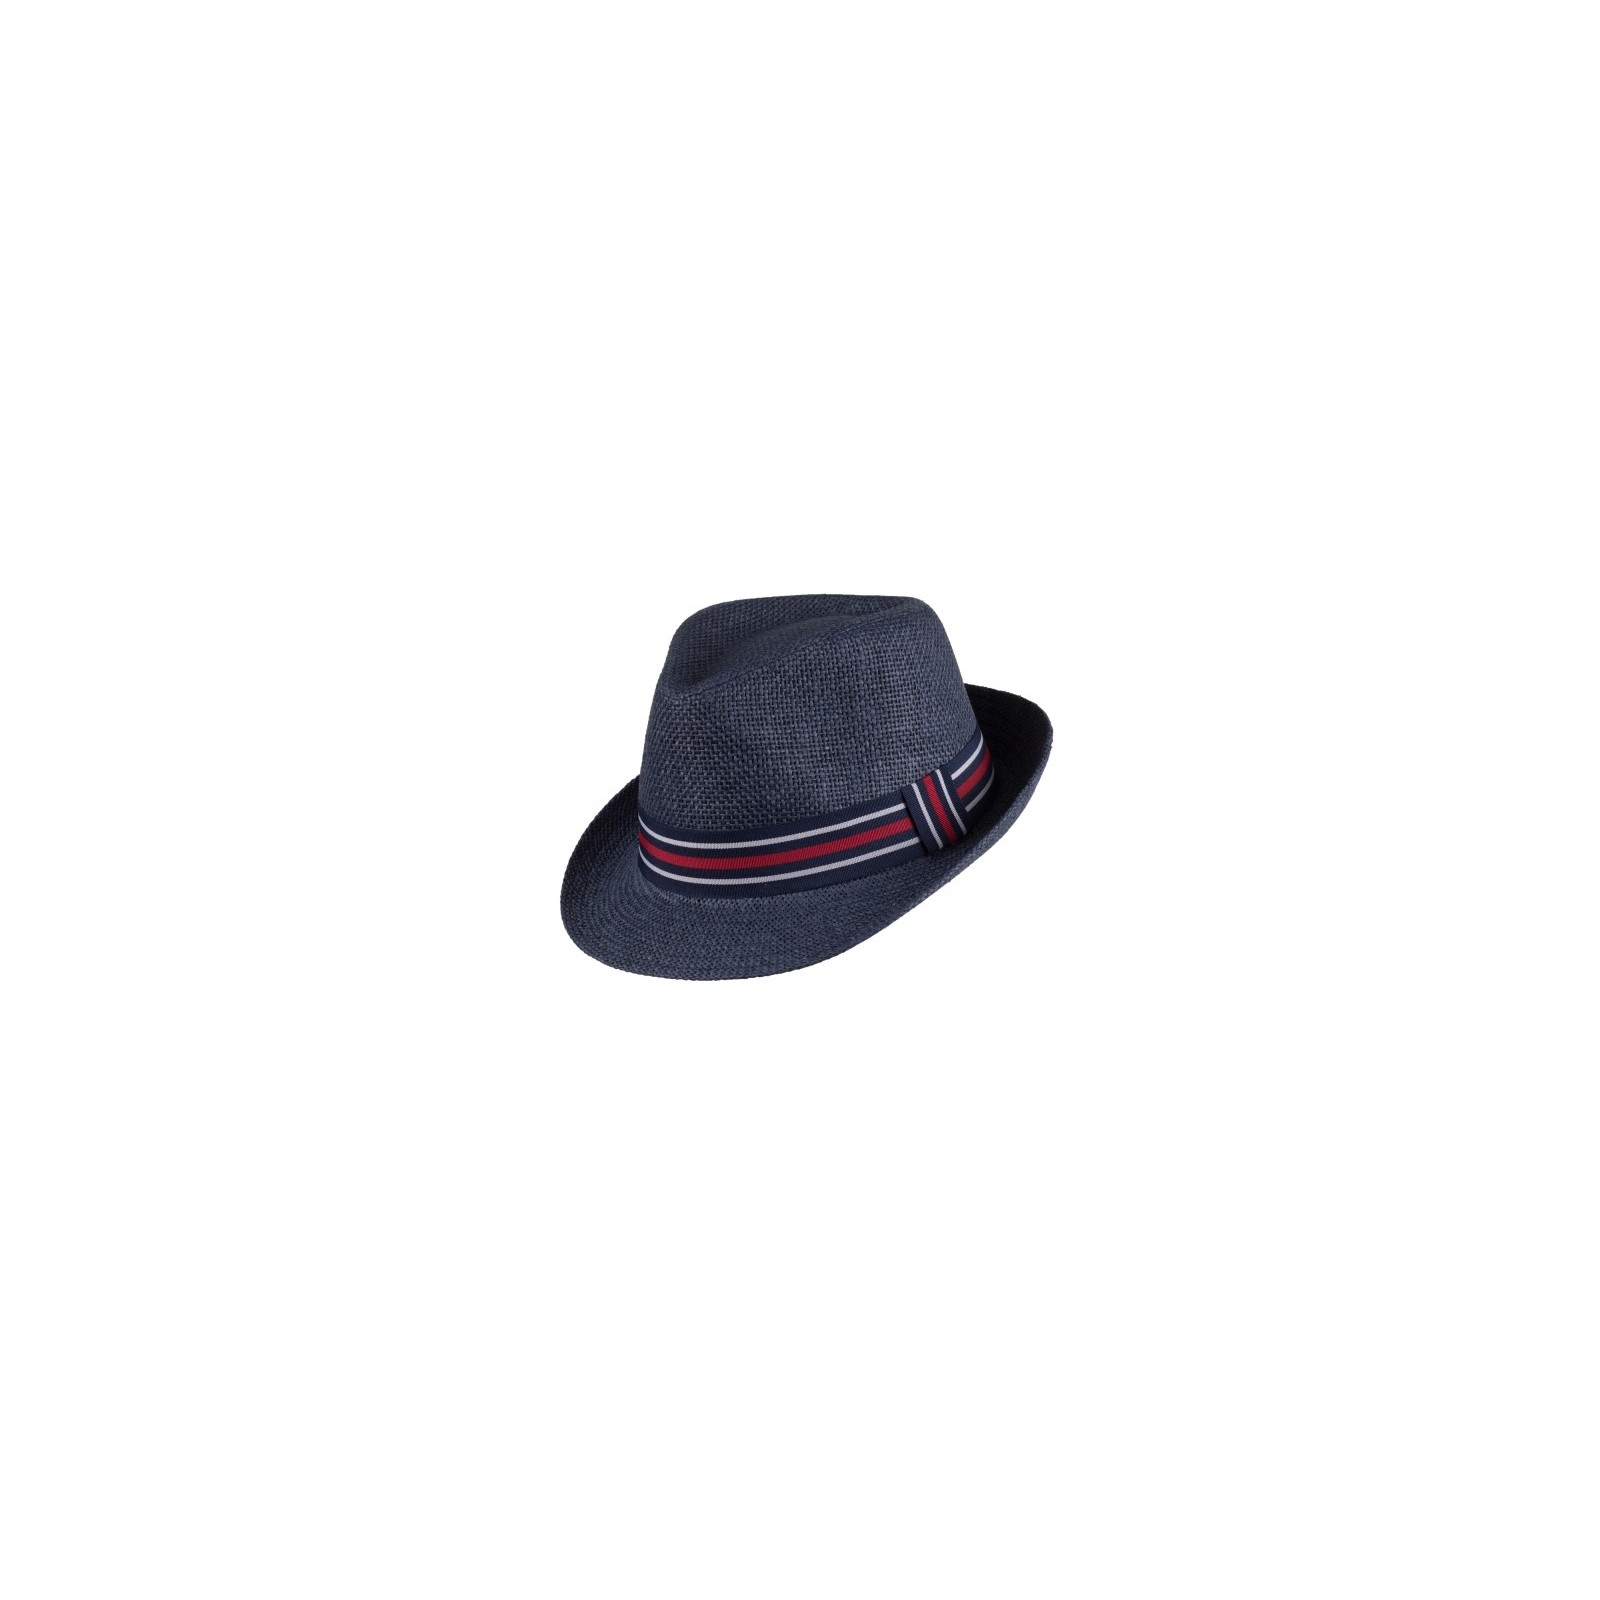 Scippis Nardo hoed